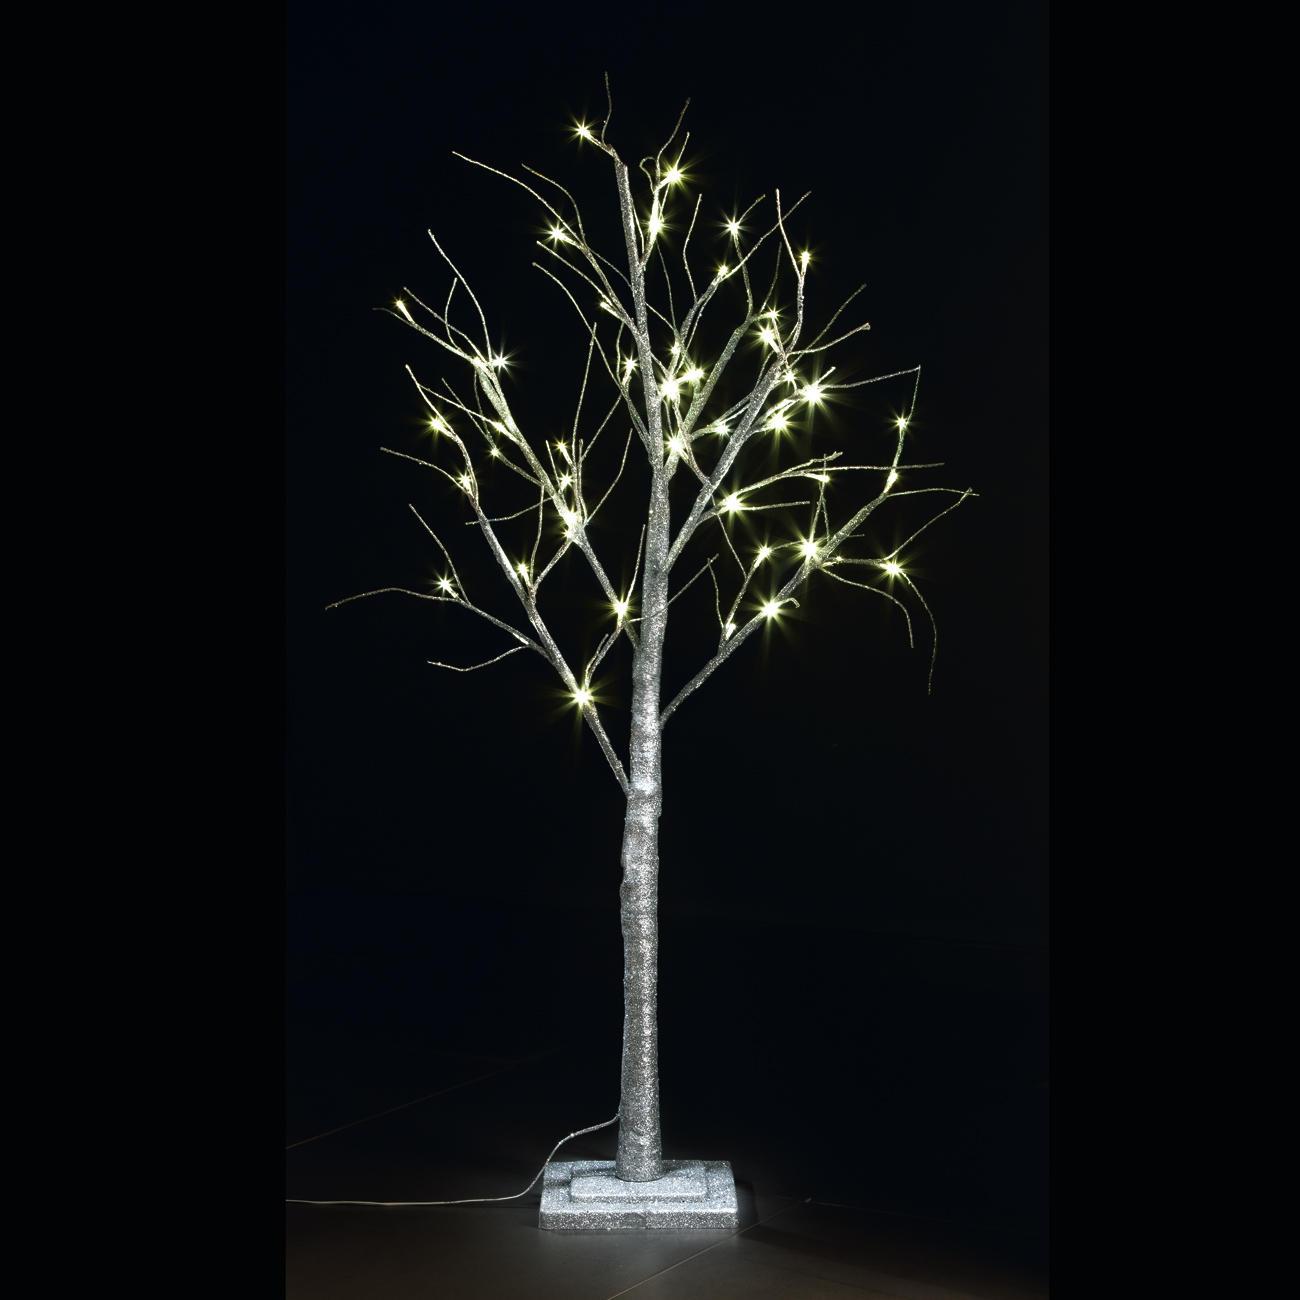 LED Deko-Baum, Silber